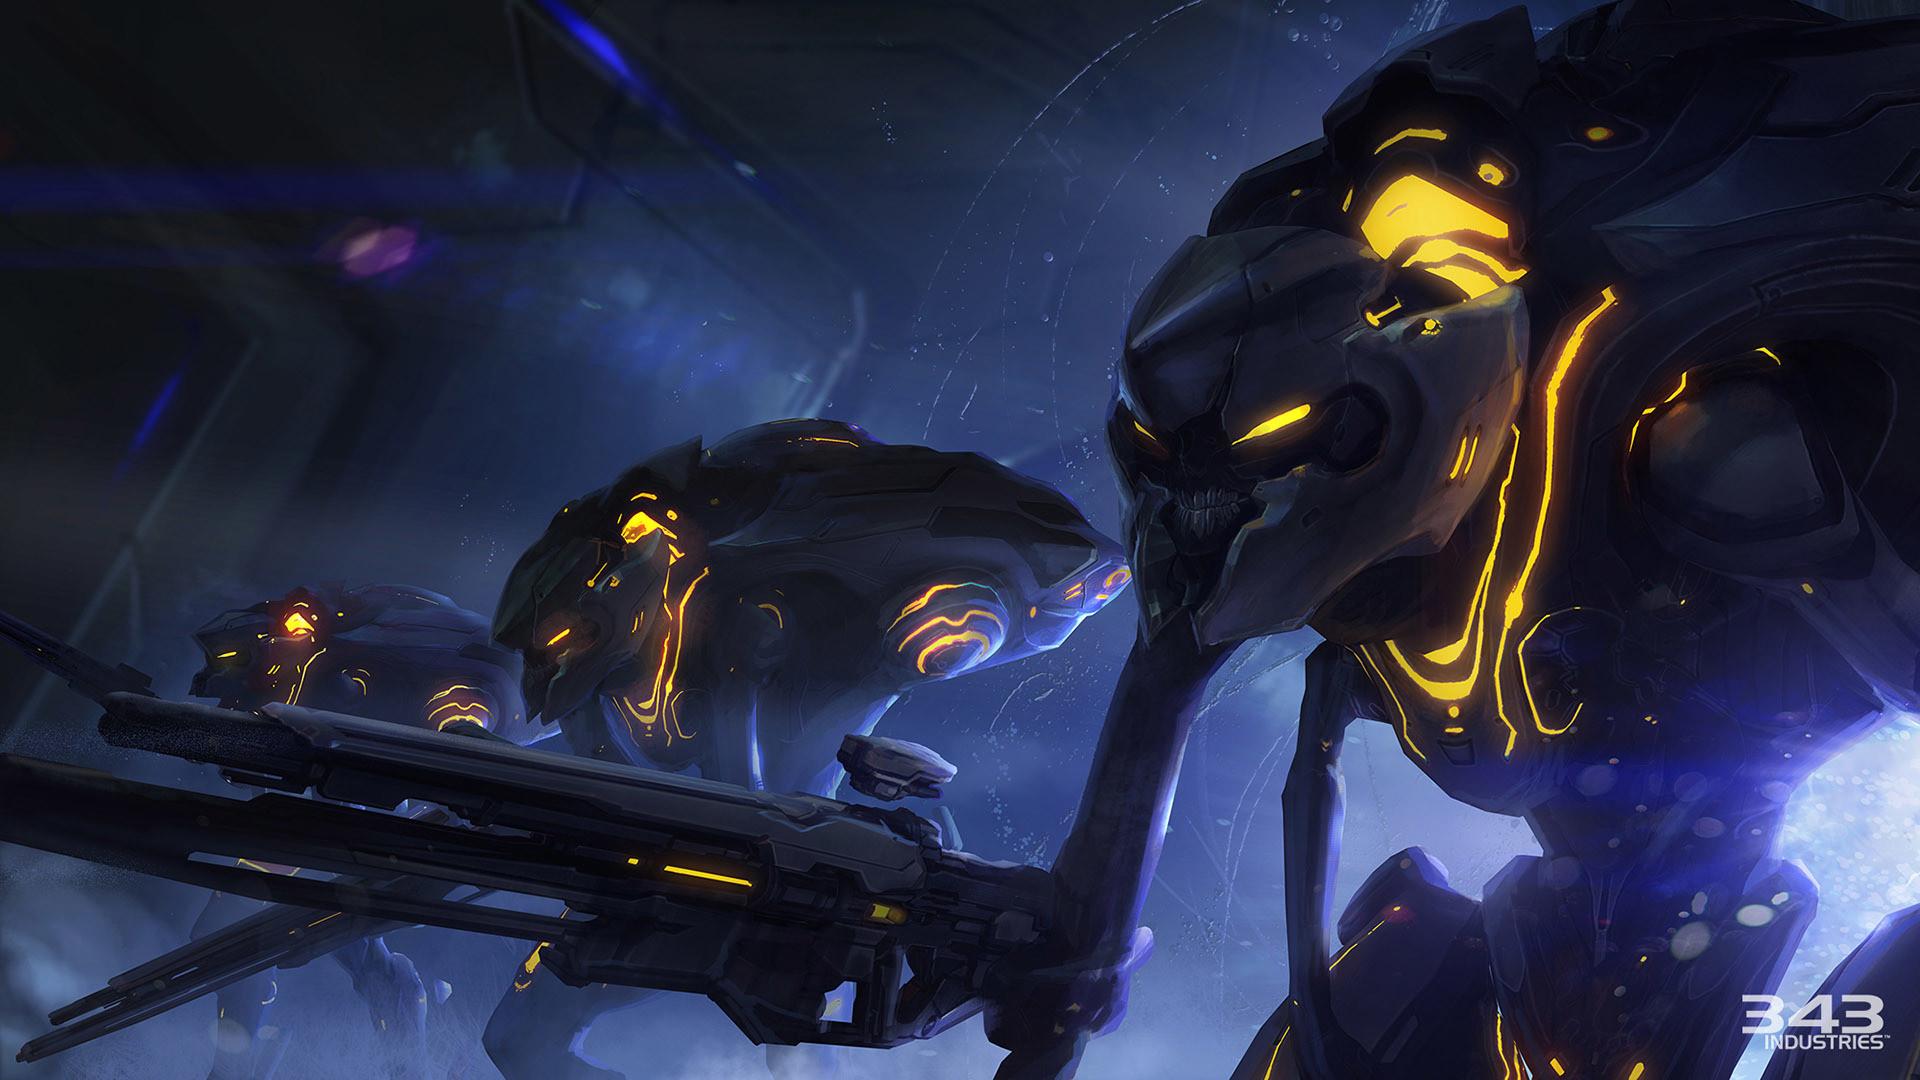 Halo 5: Guardians HD Wallpaper 1920×1080